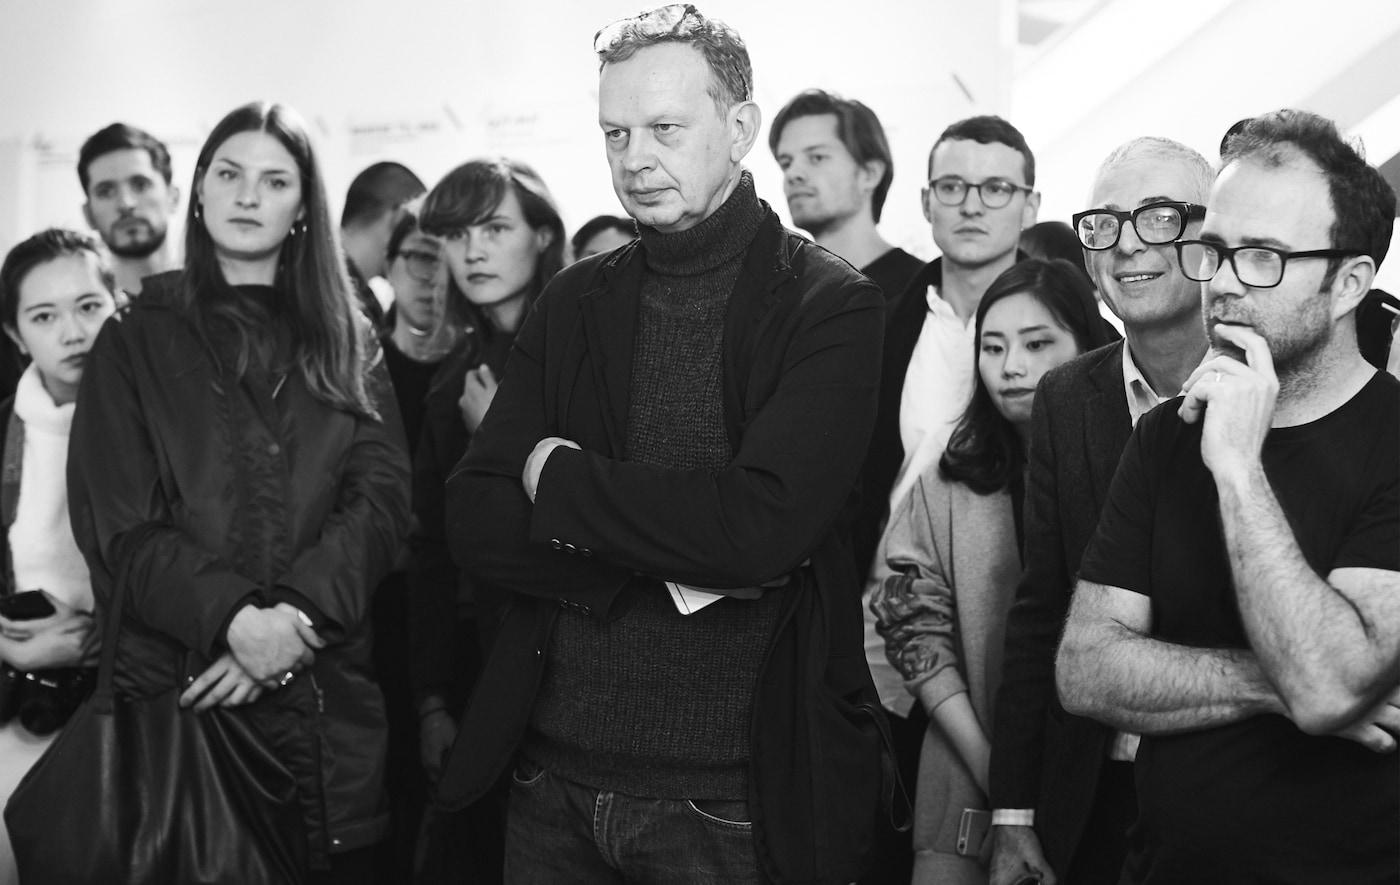 A black-and-white portrait of designer Tom Dixon and his team.